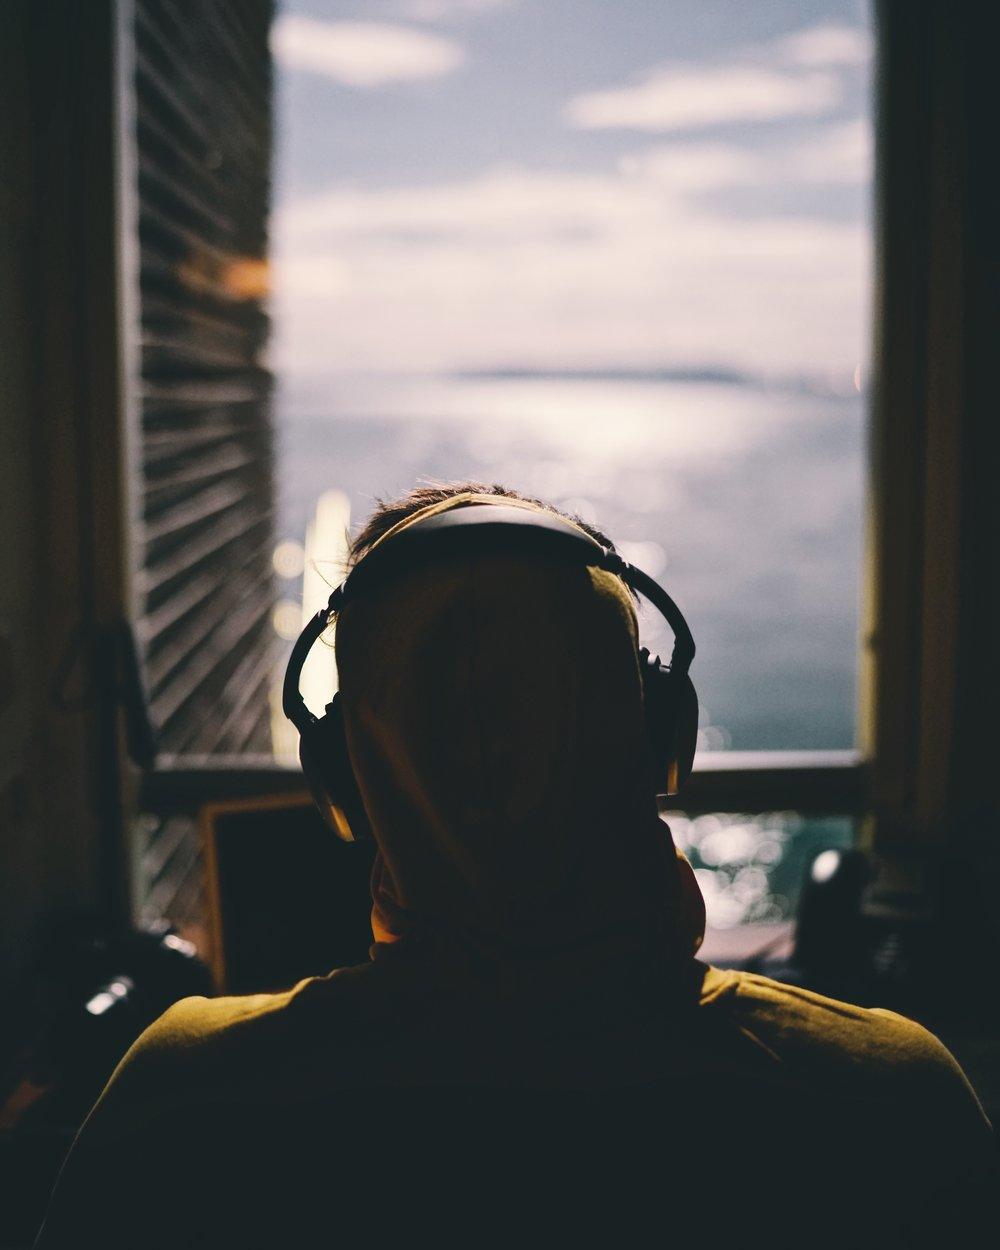 Man earphones looking out window © Reynier Carl.jpg